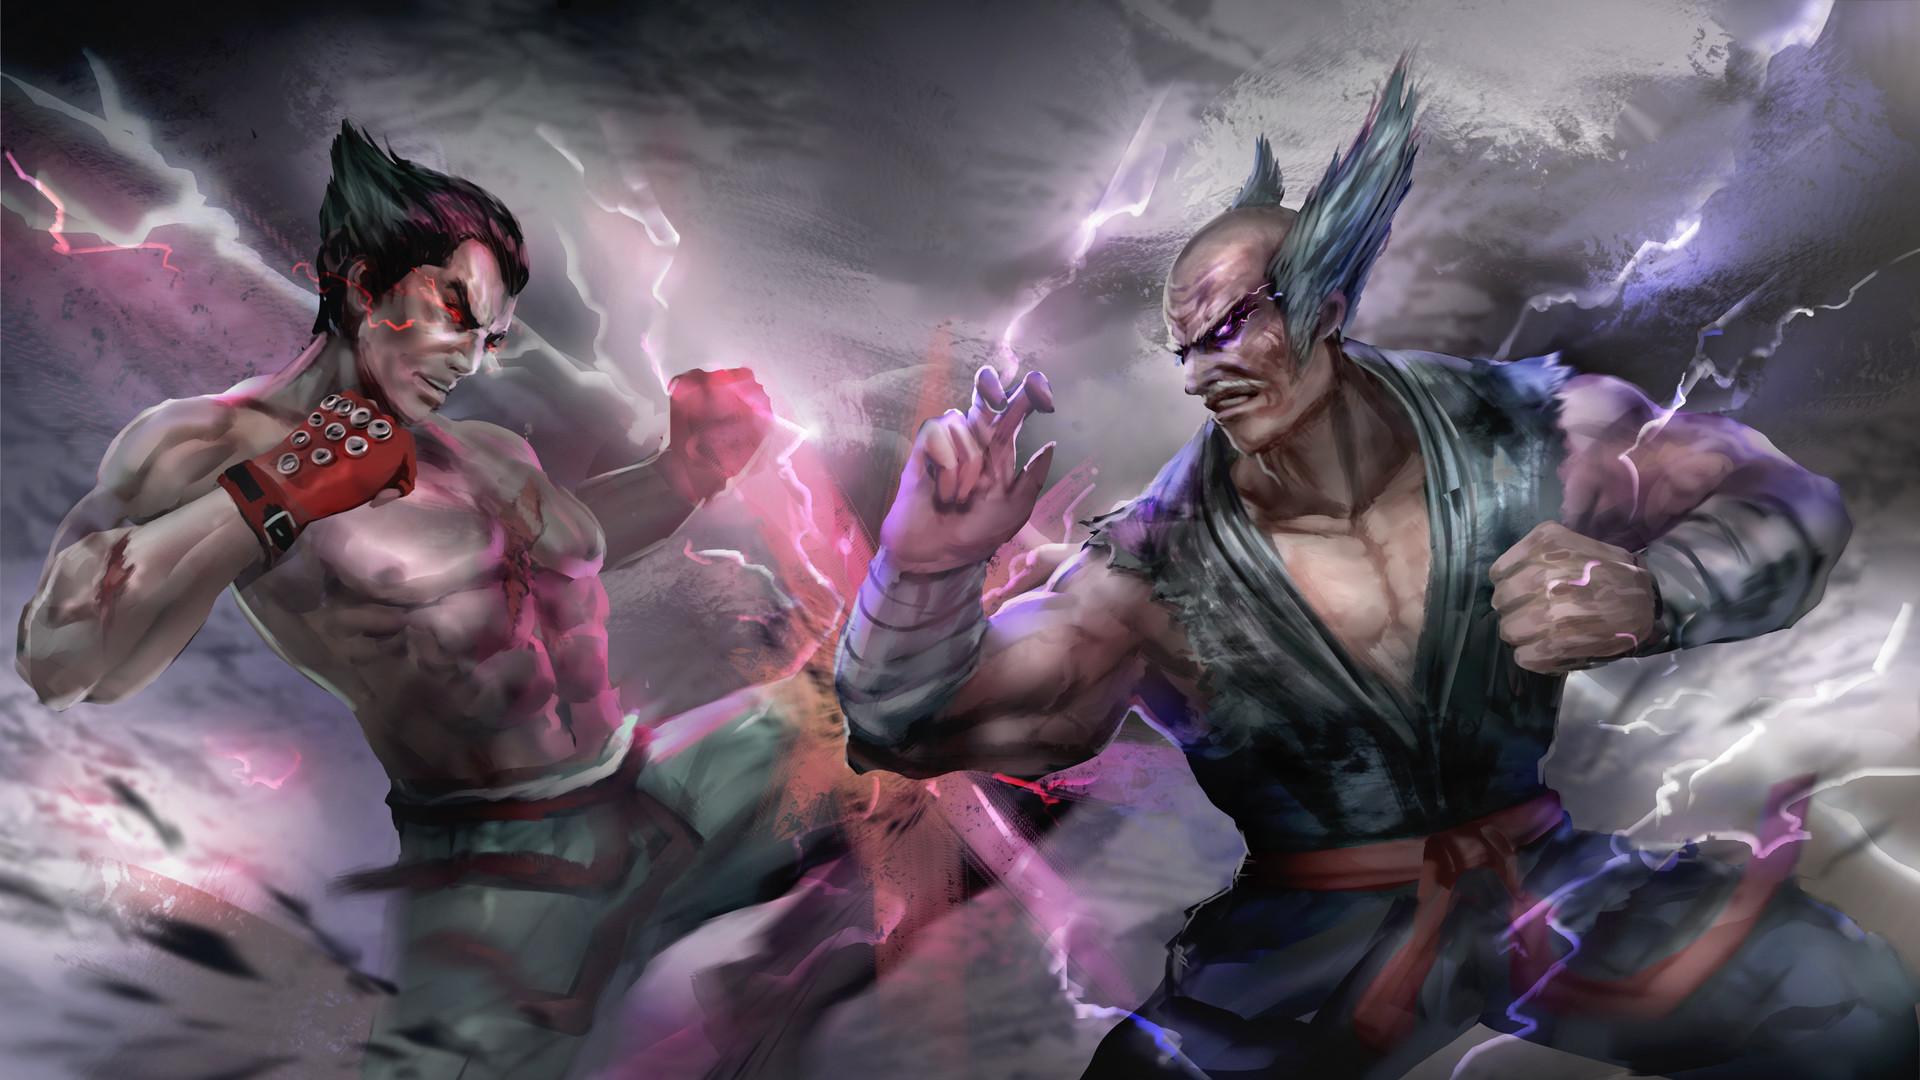 SPONSORED ART : Tekken 7, Yong Hui Ng